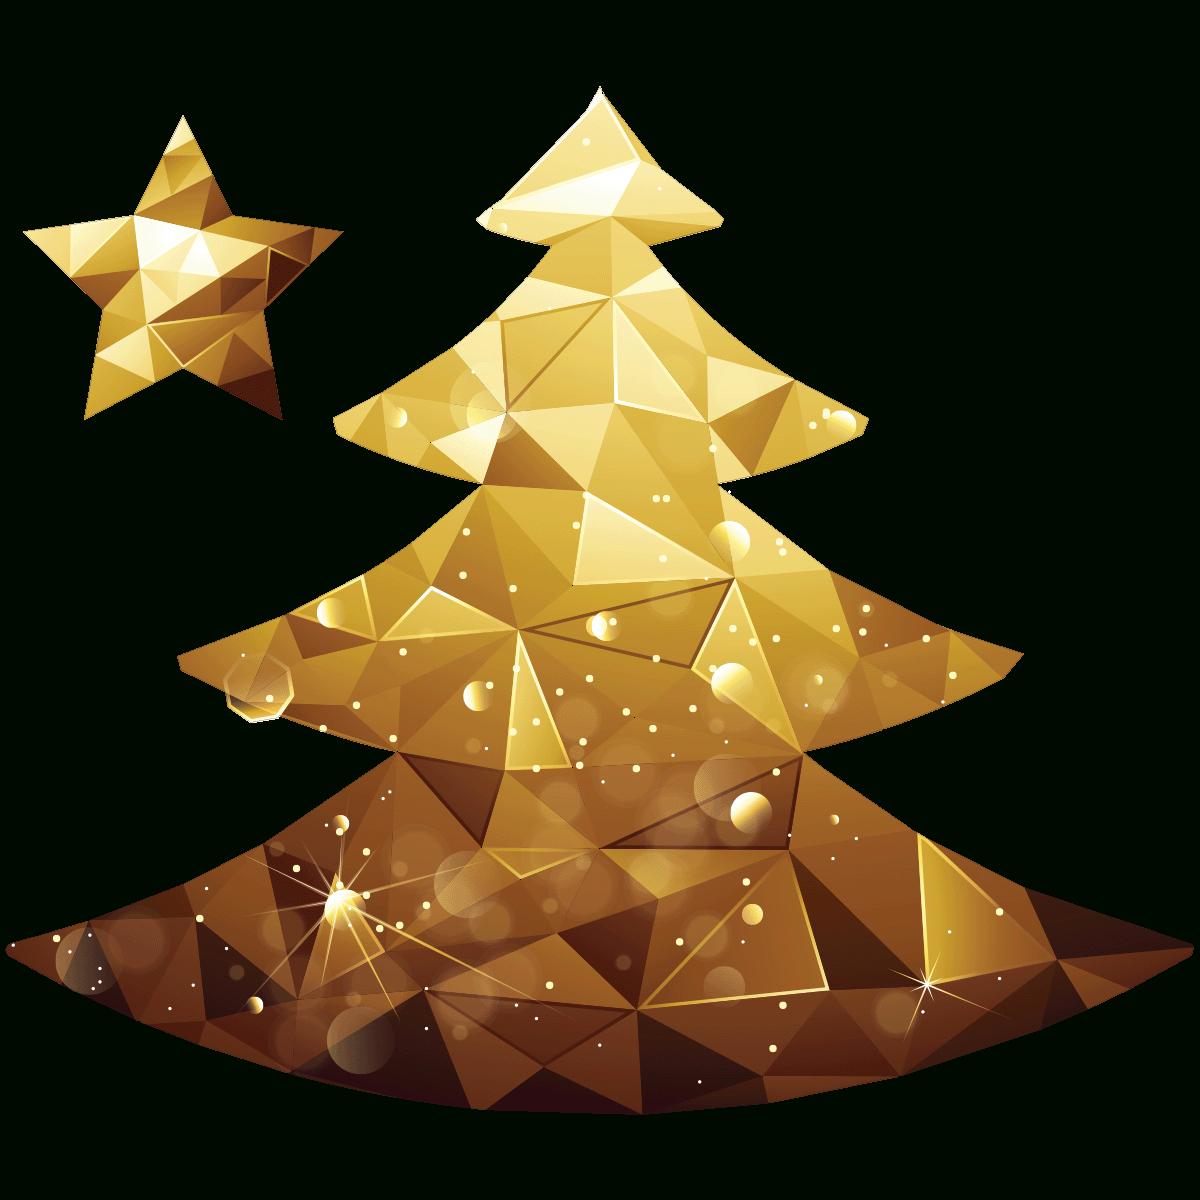 Sticker Noël Sapin Origami concernant Origami Sapin De Noel